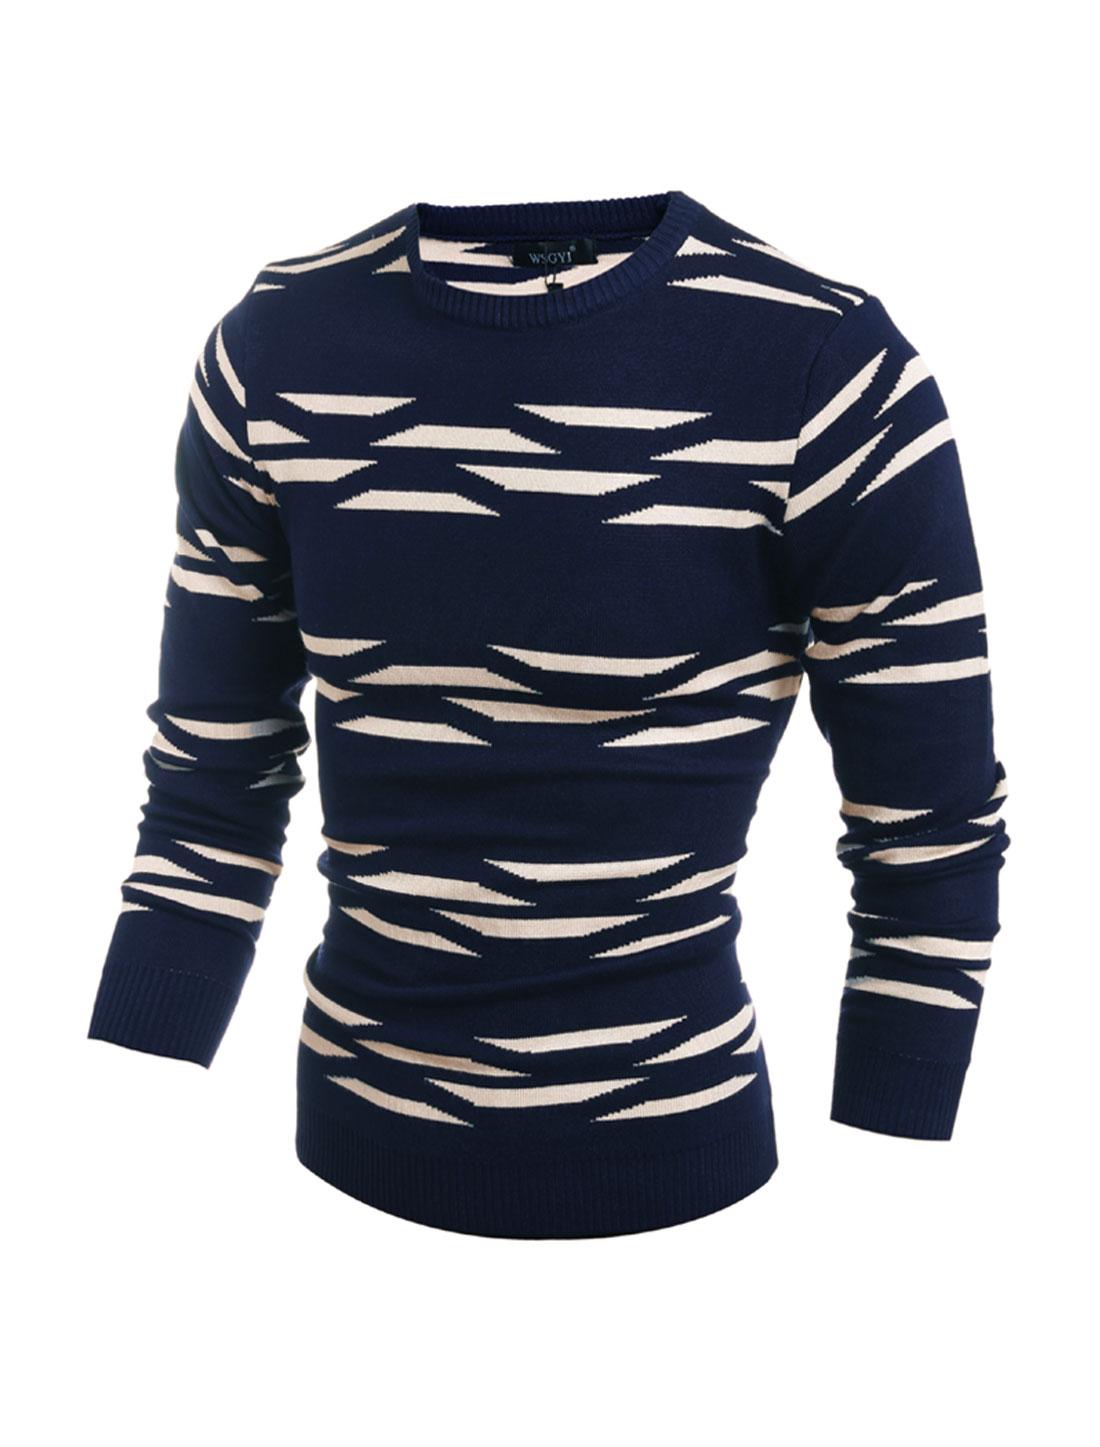 Men Crew Neck Geometric Slim Fit Knit Shirt Blue M